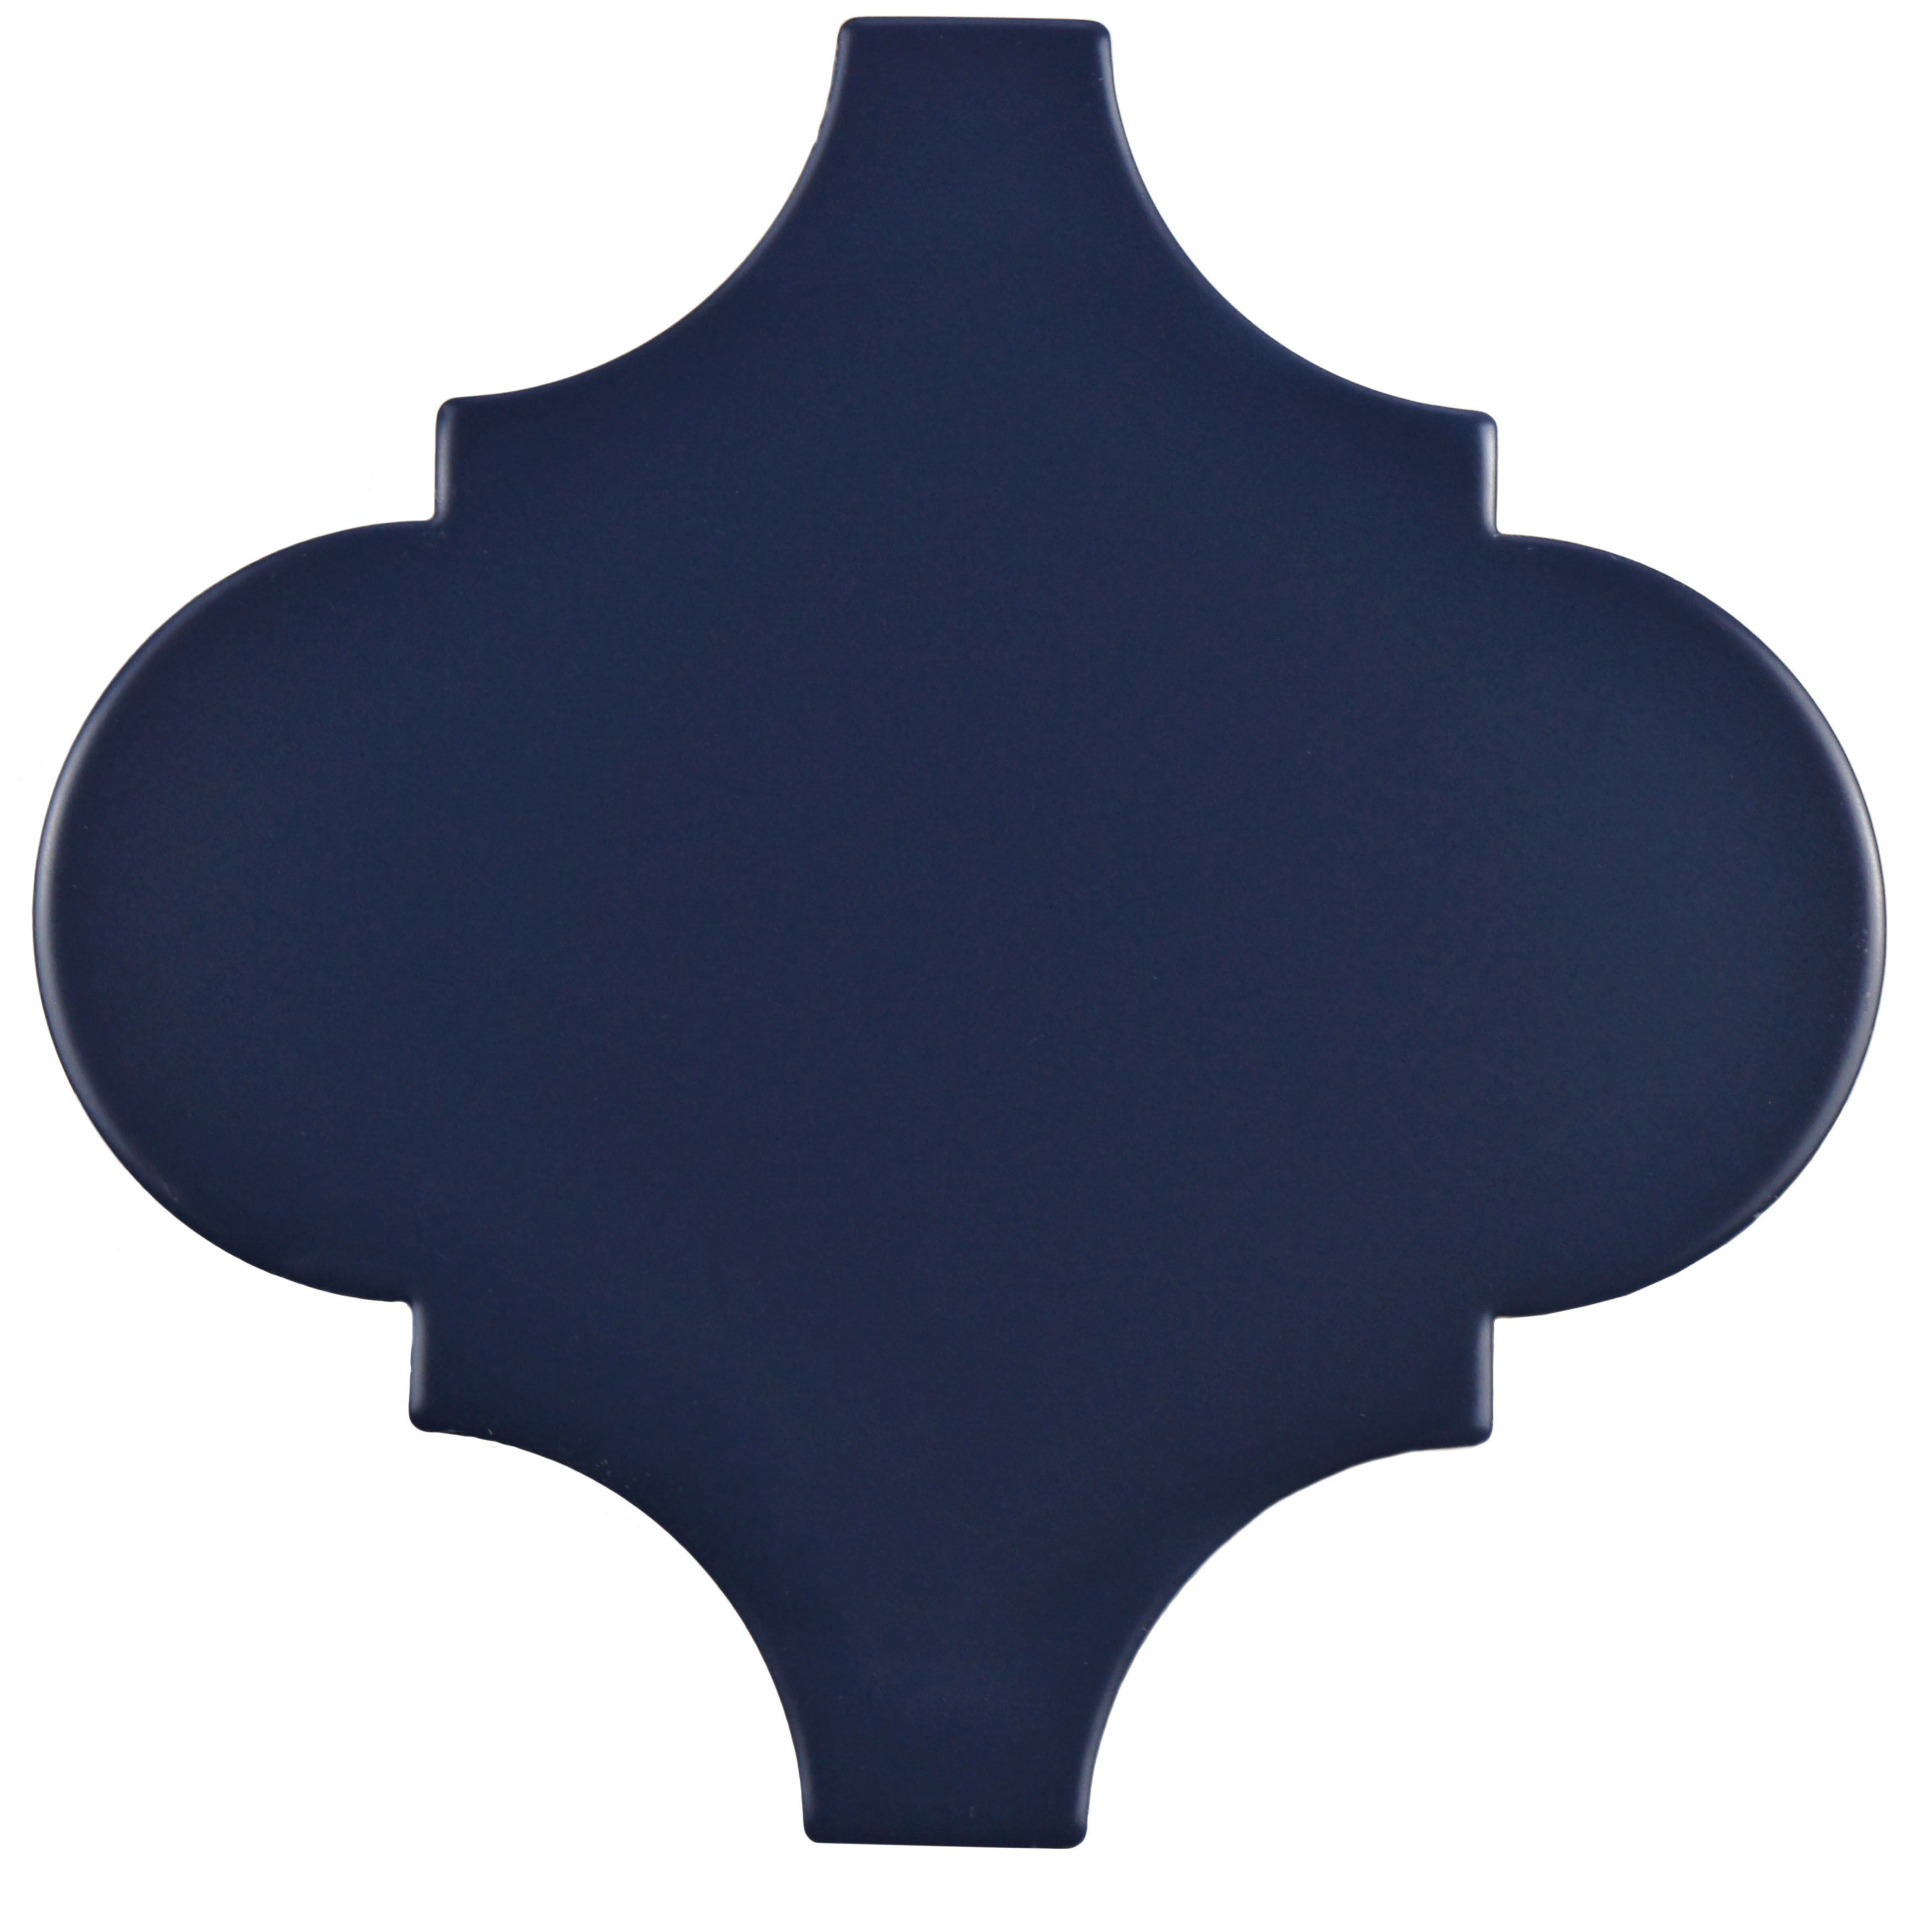 SomerTile 8x8-inch Francesco Lantern Bleu Porcelain Floor and Wall ...